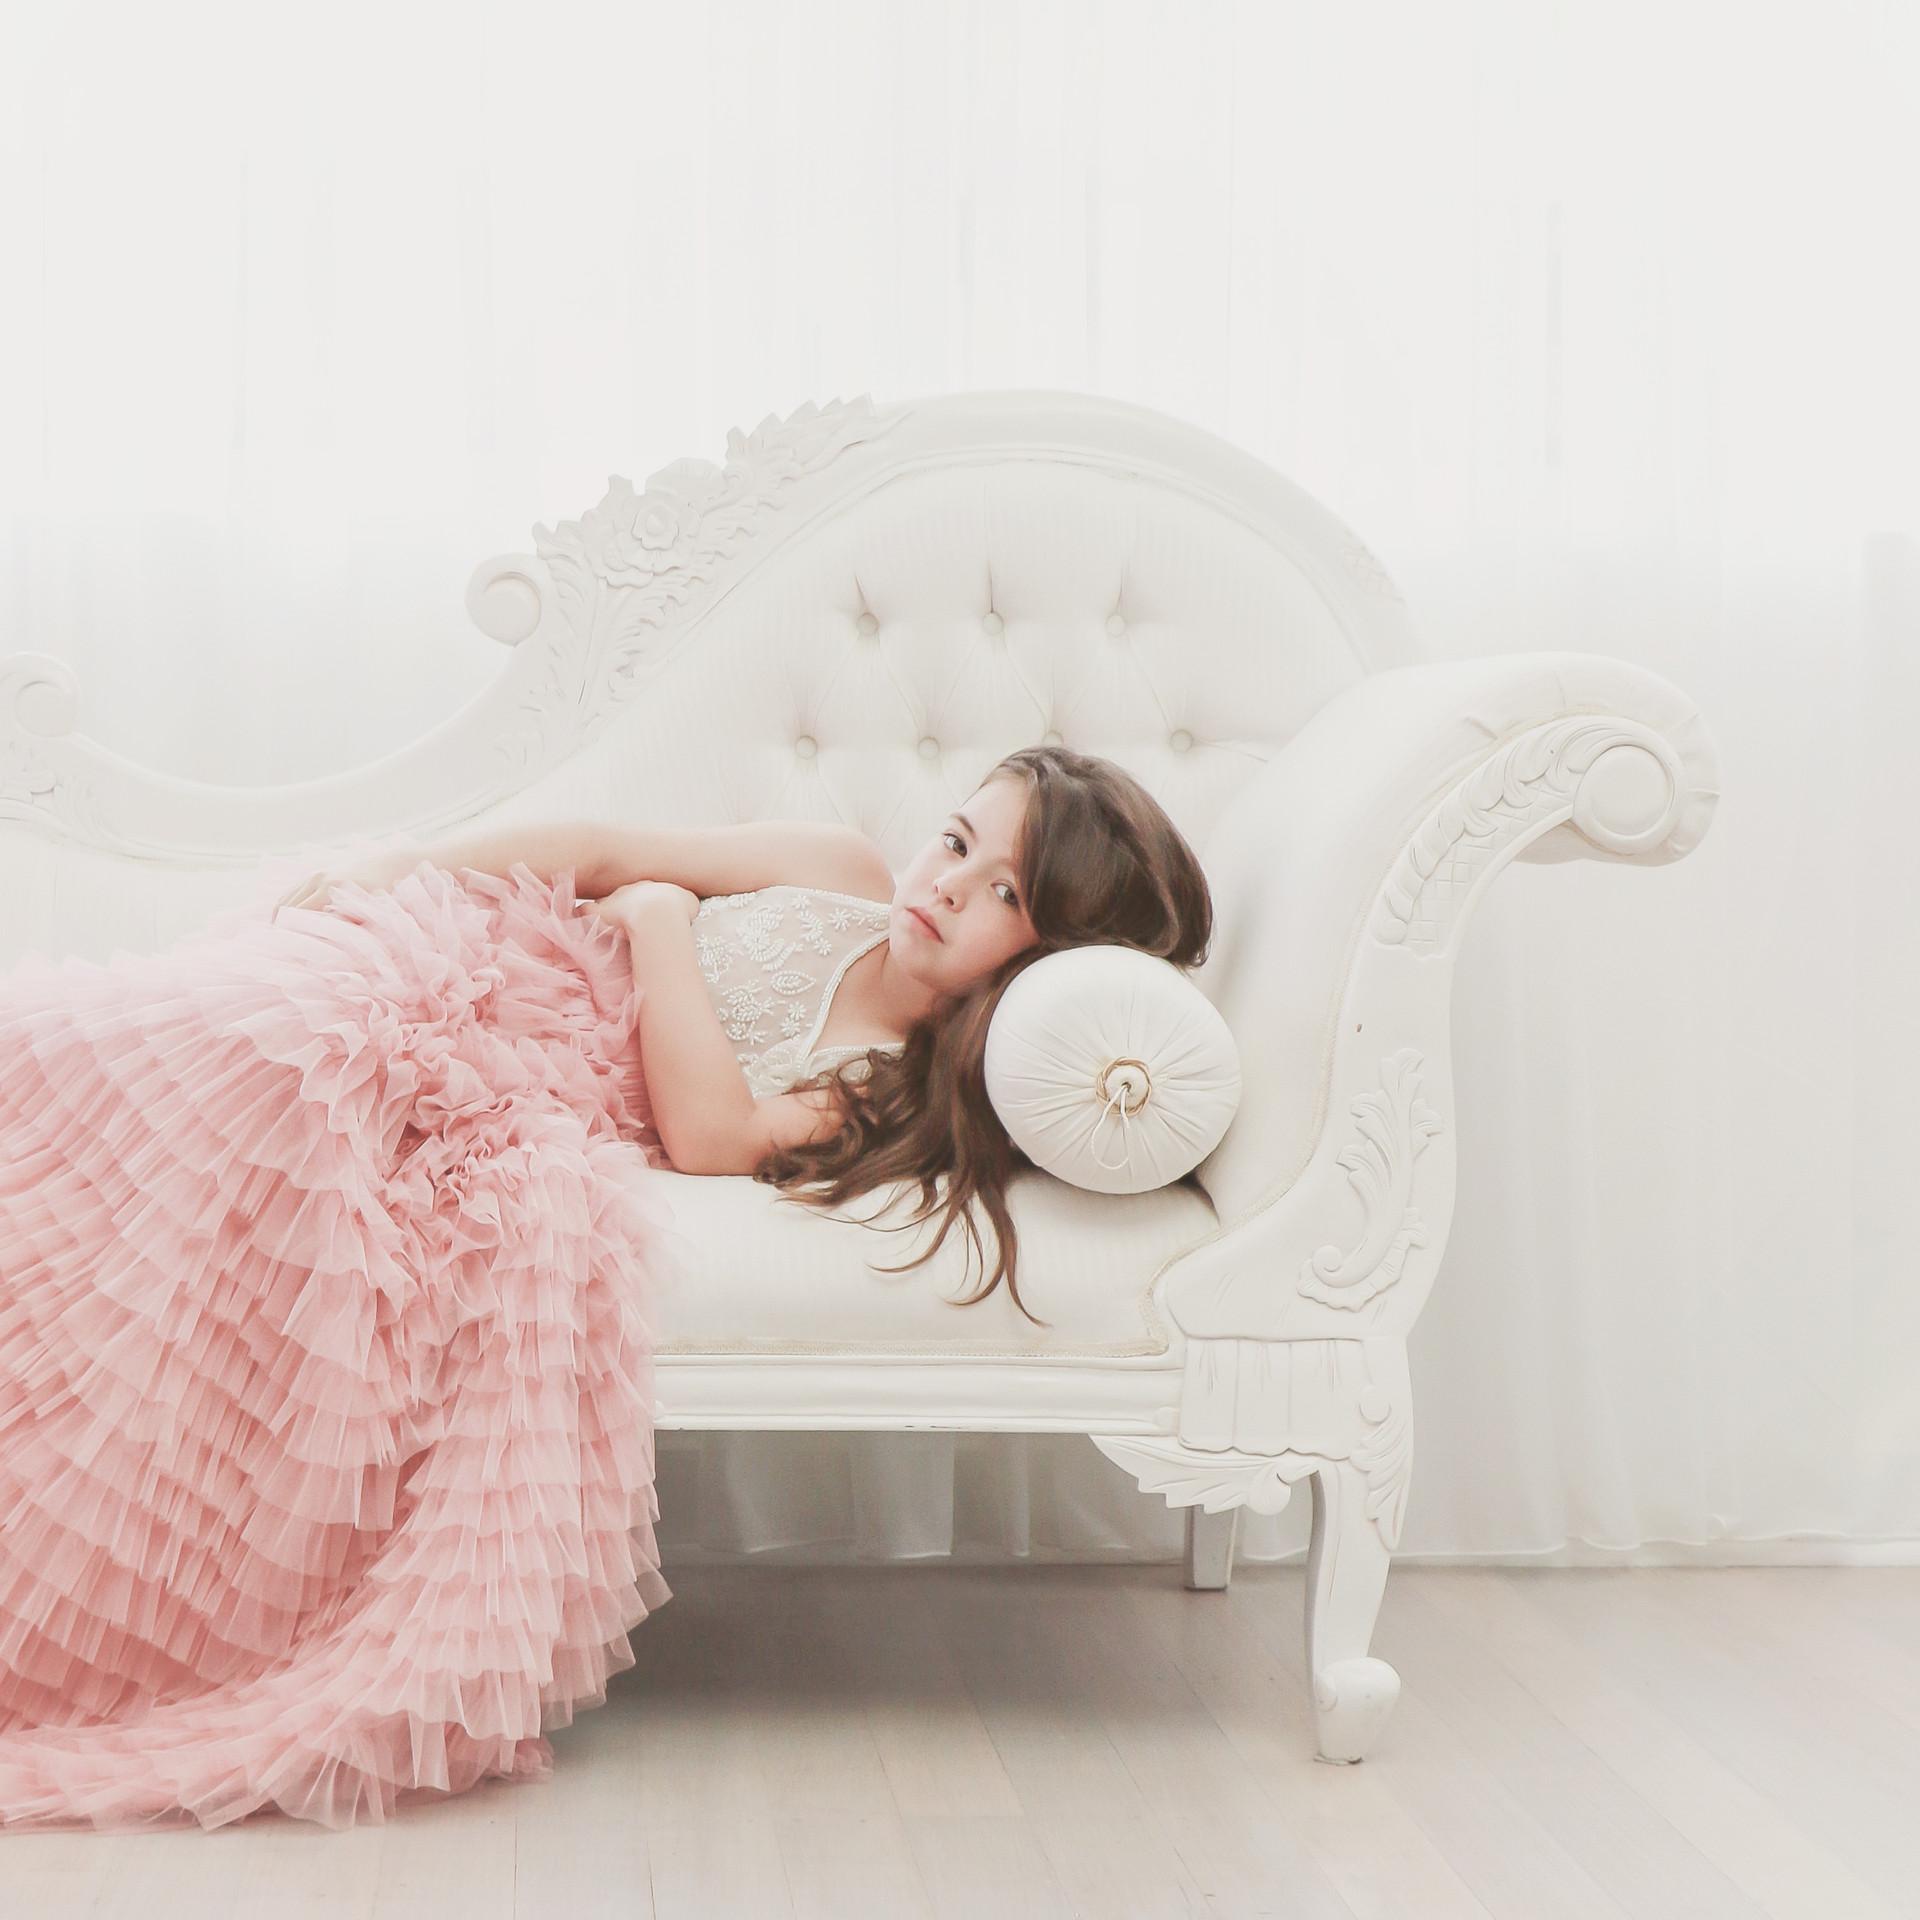 Indigo. Creative Children's Photography Studio shoot, Dream Alice Photography & Art, Gold Coast